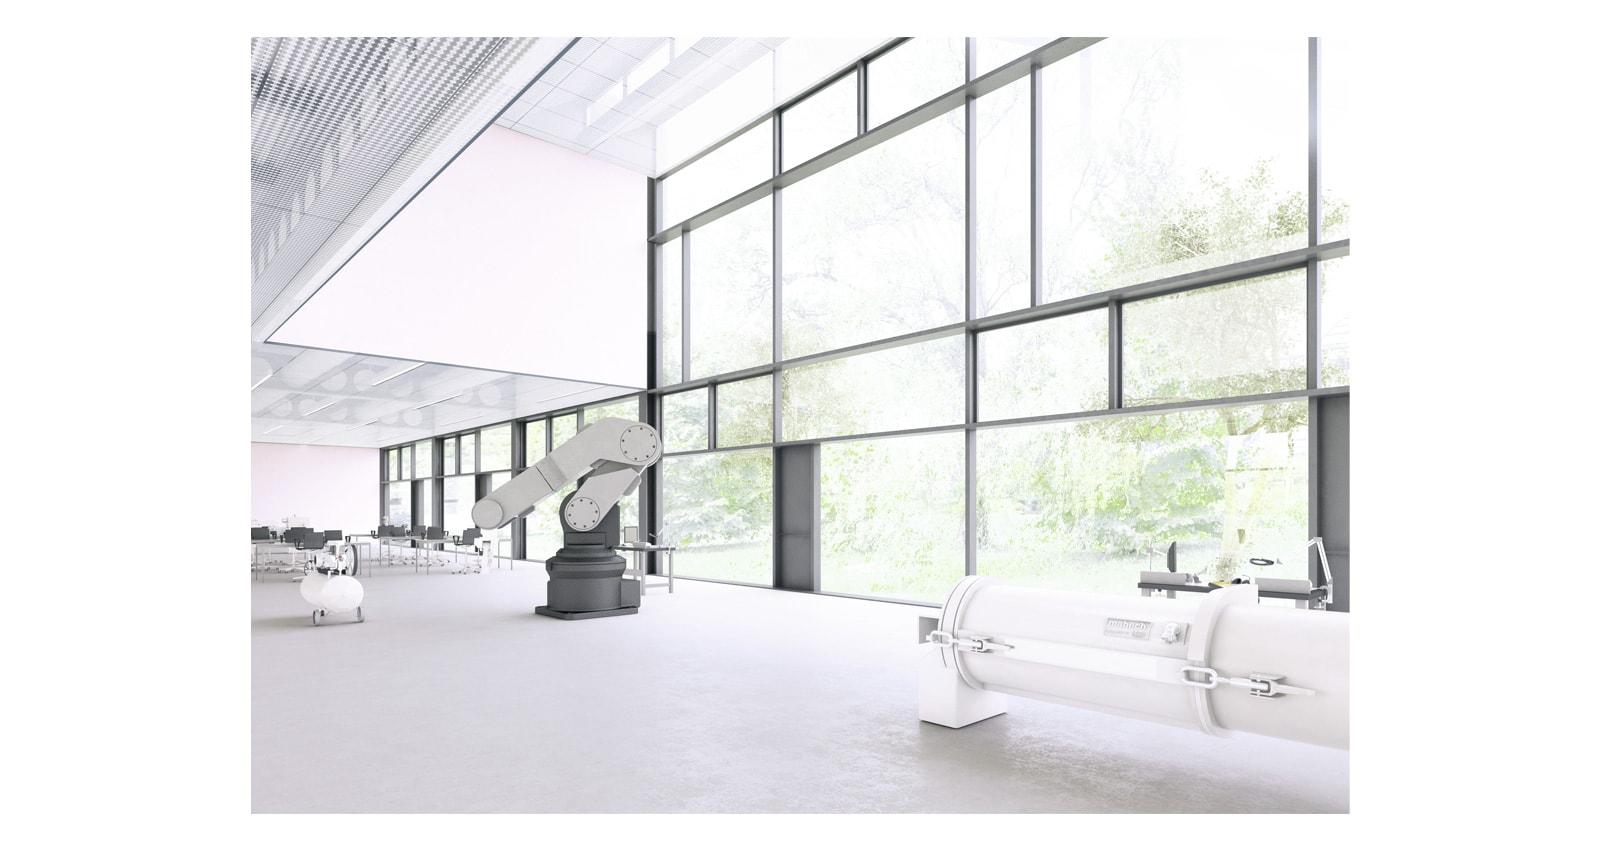 scuole-innovative-ferrara-workshop-02